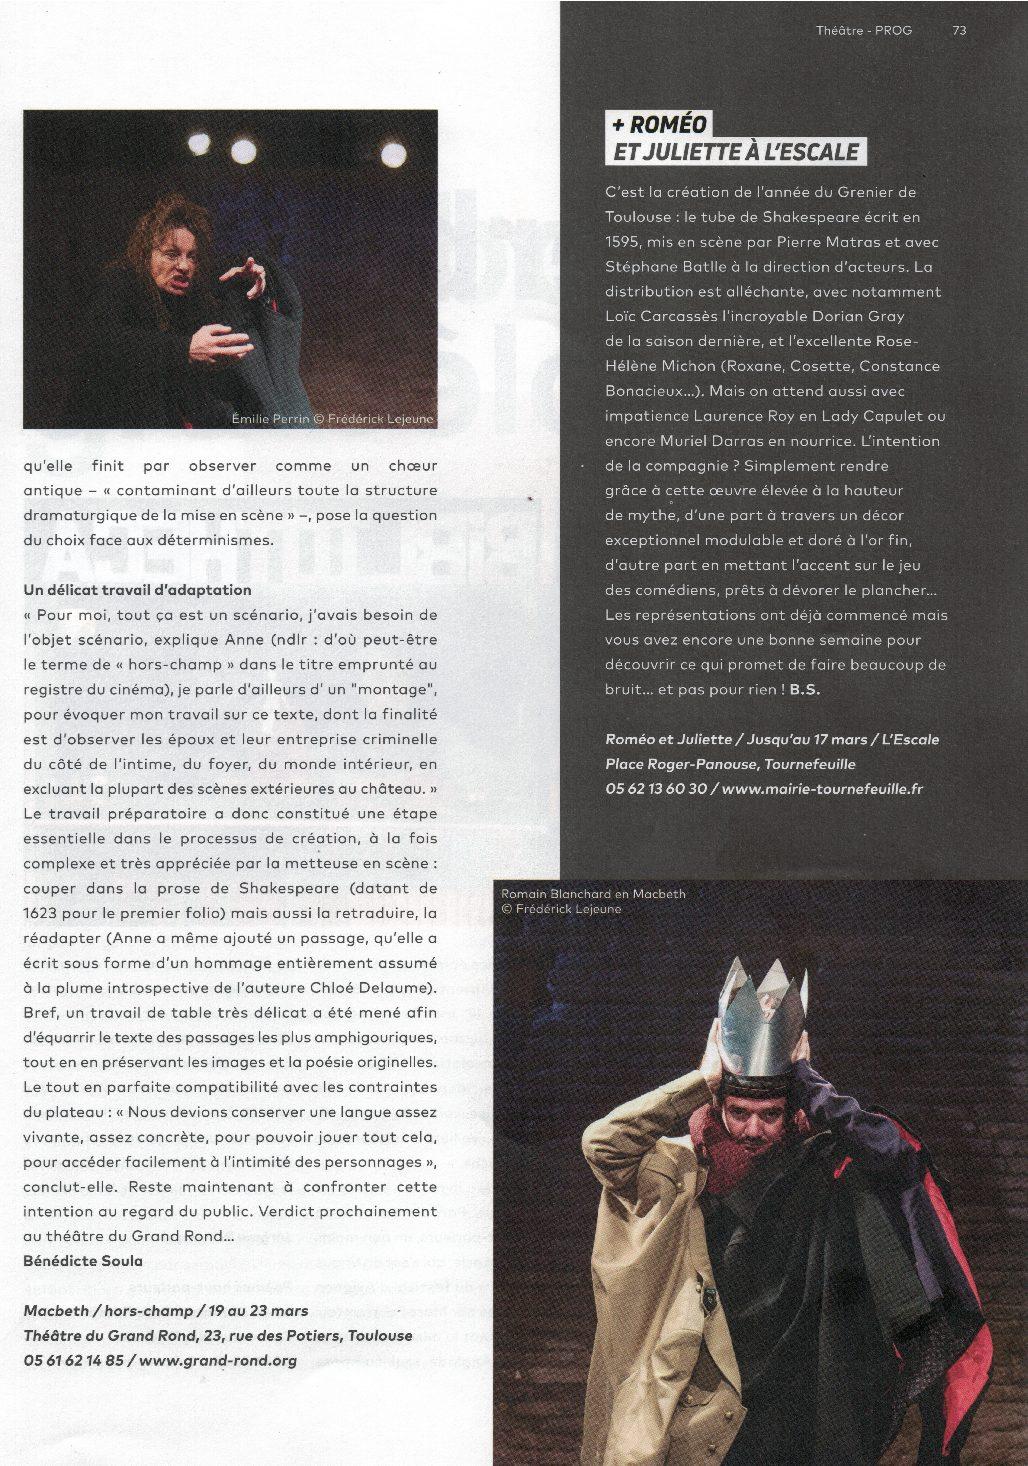 Le Brigadier / Macbeth/hors-champ